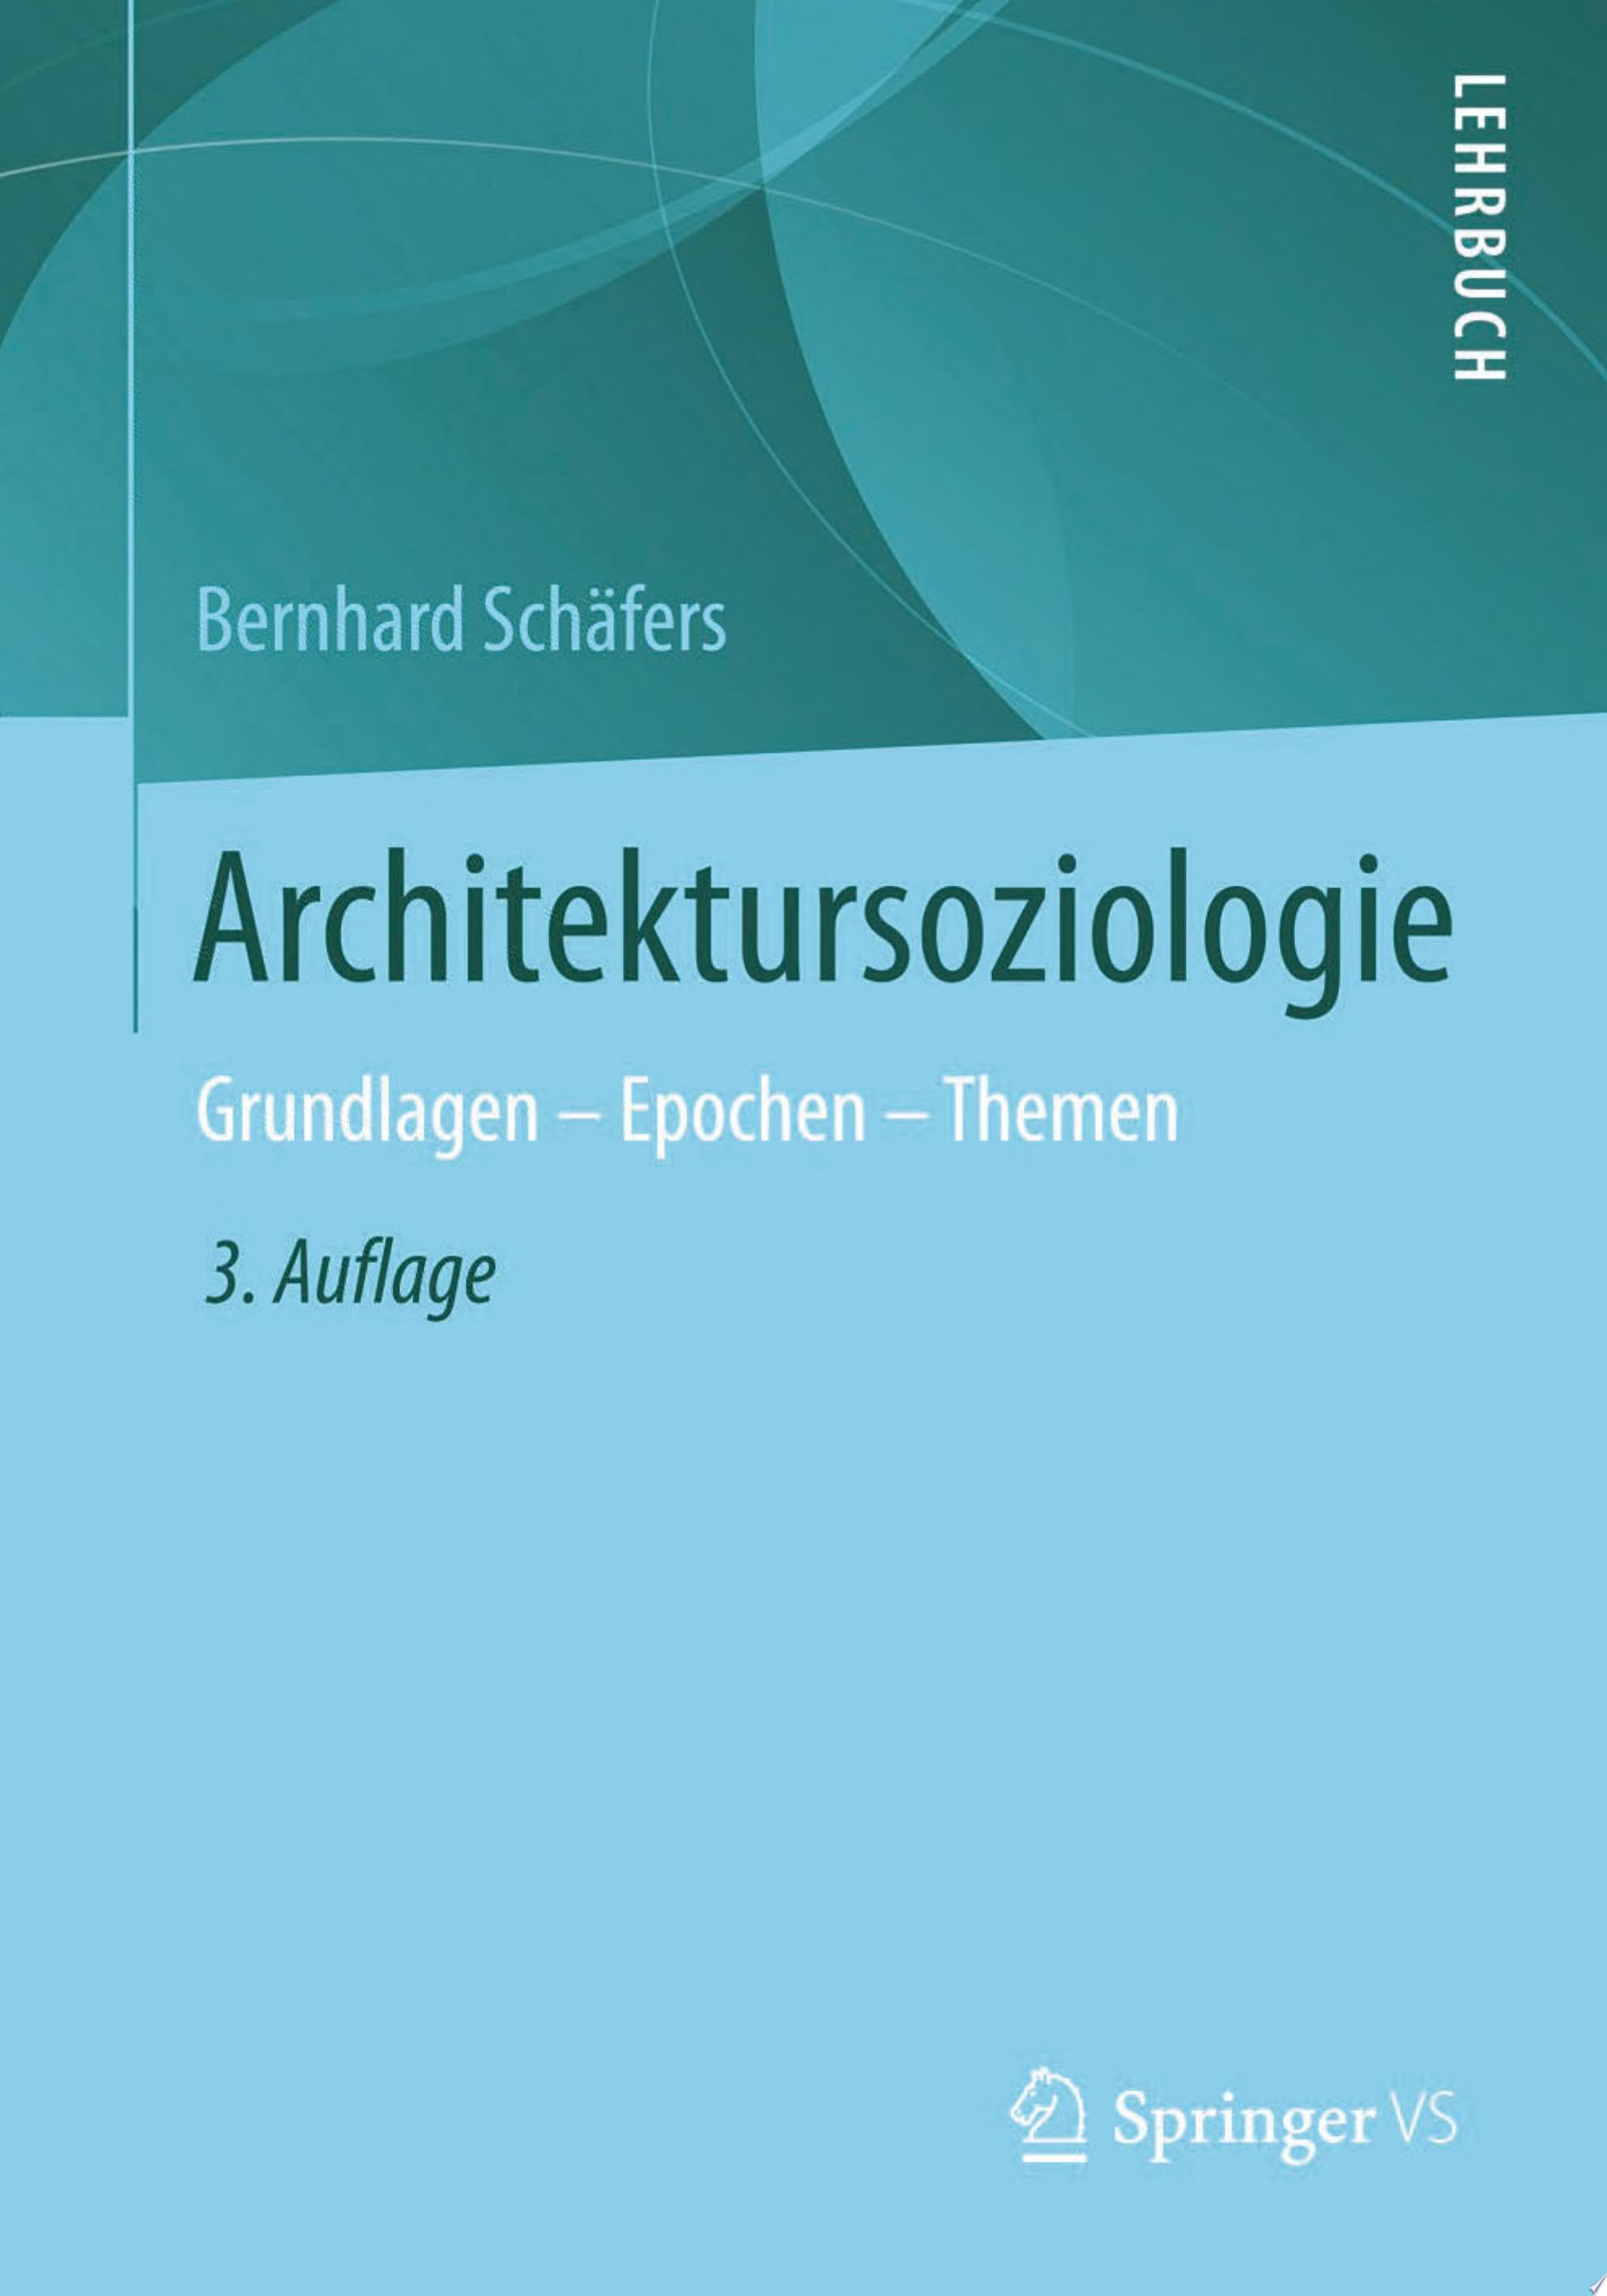 Architektursoziologie